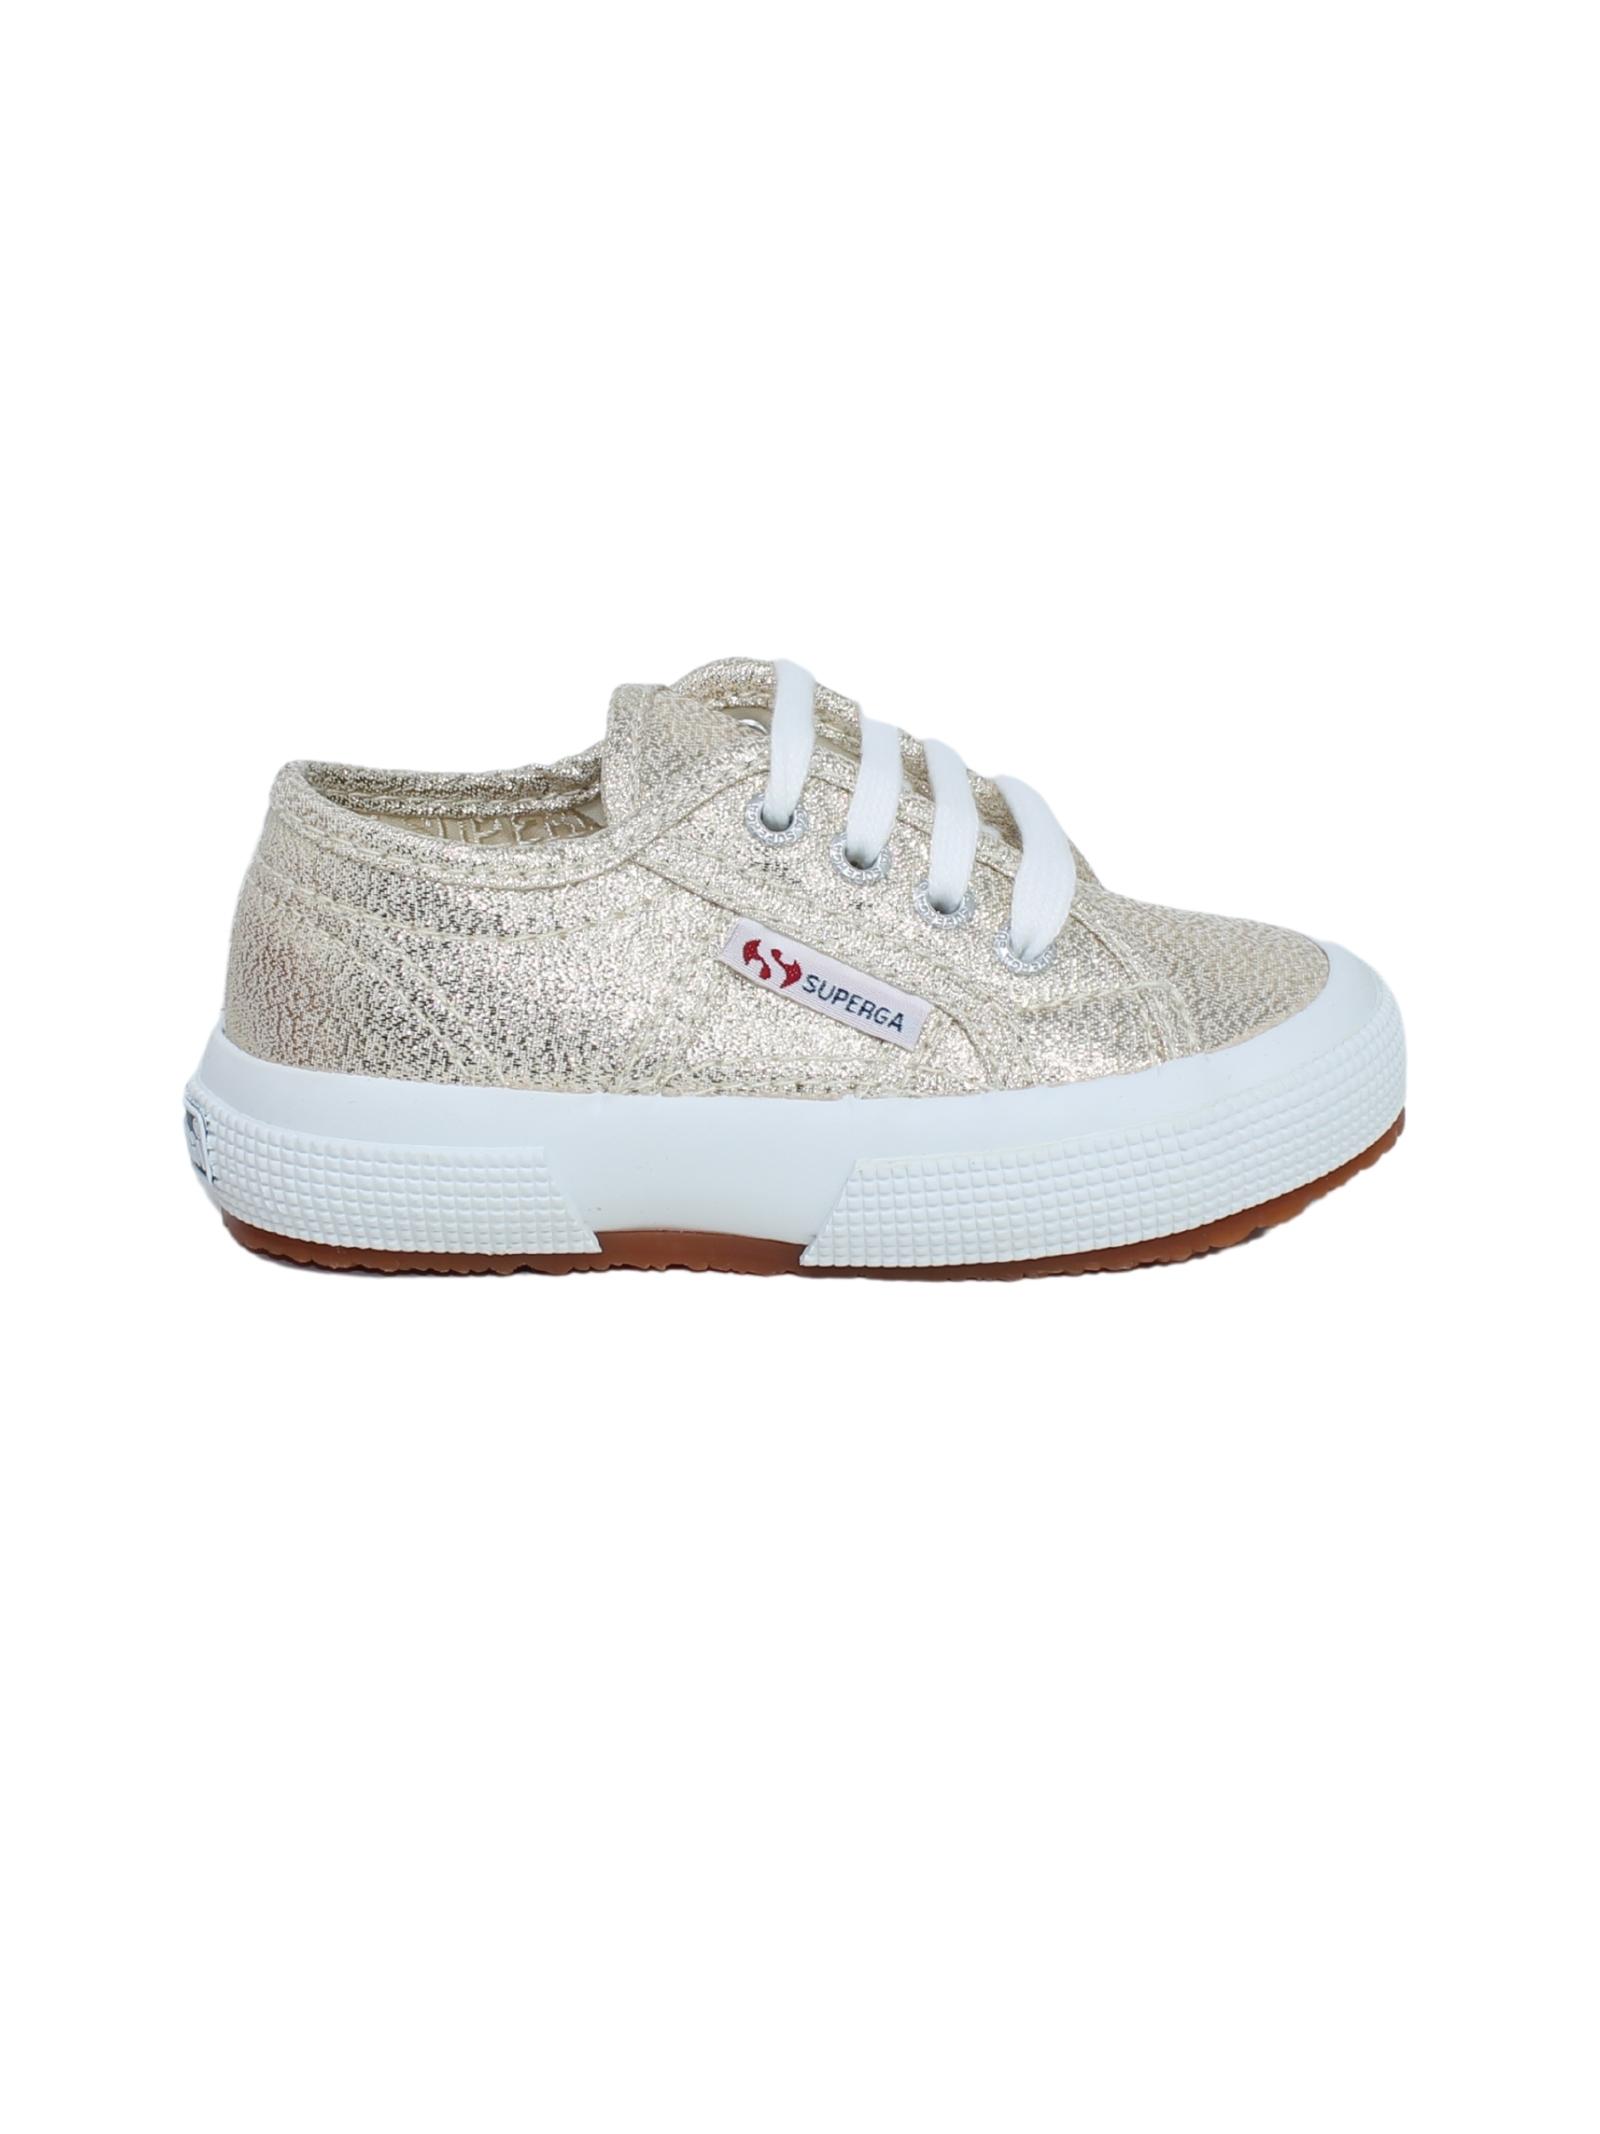 SUPERGA KIDS | Sneakers | 2750S0028T0174